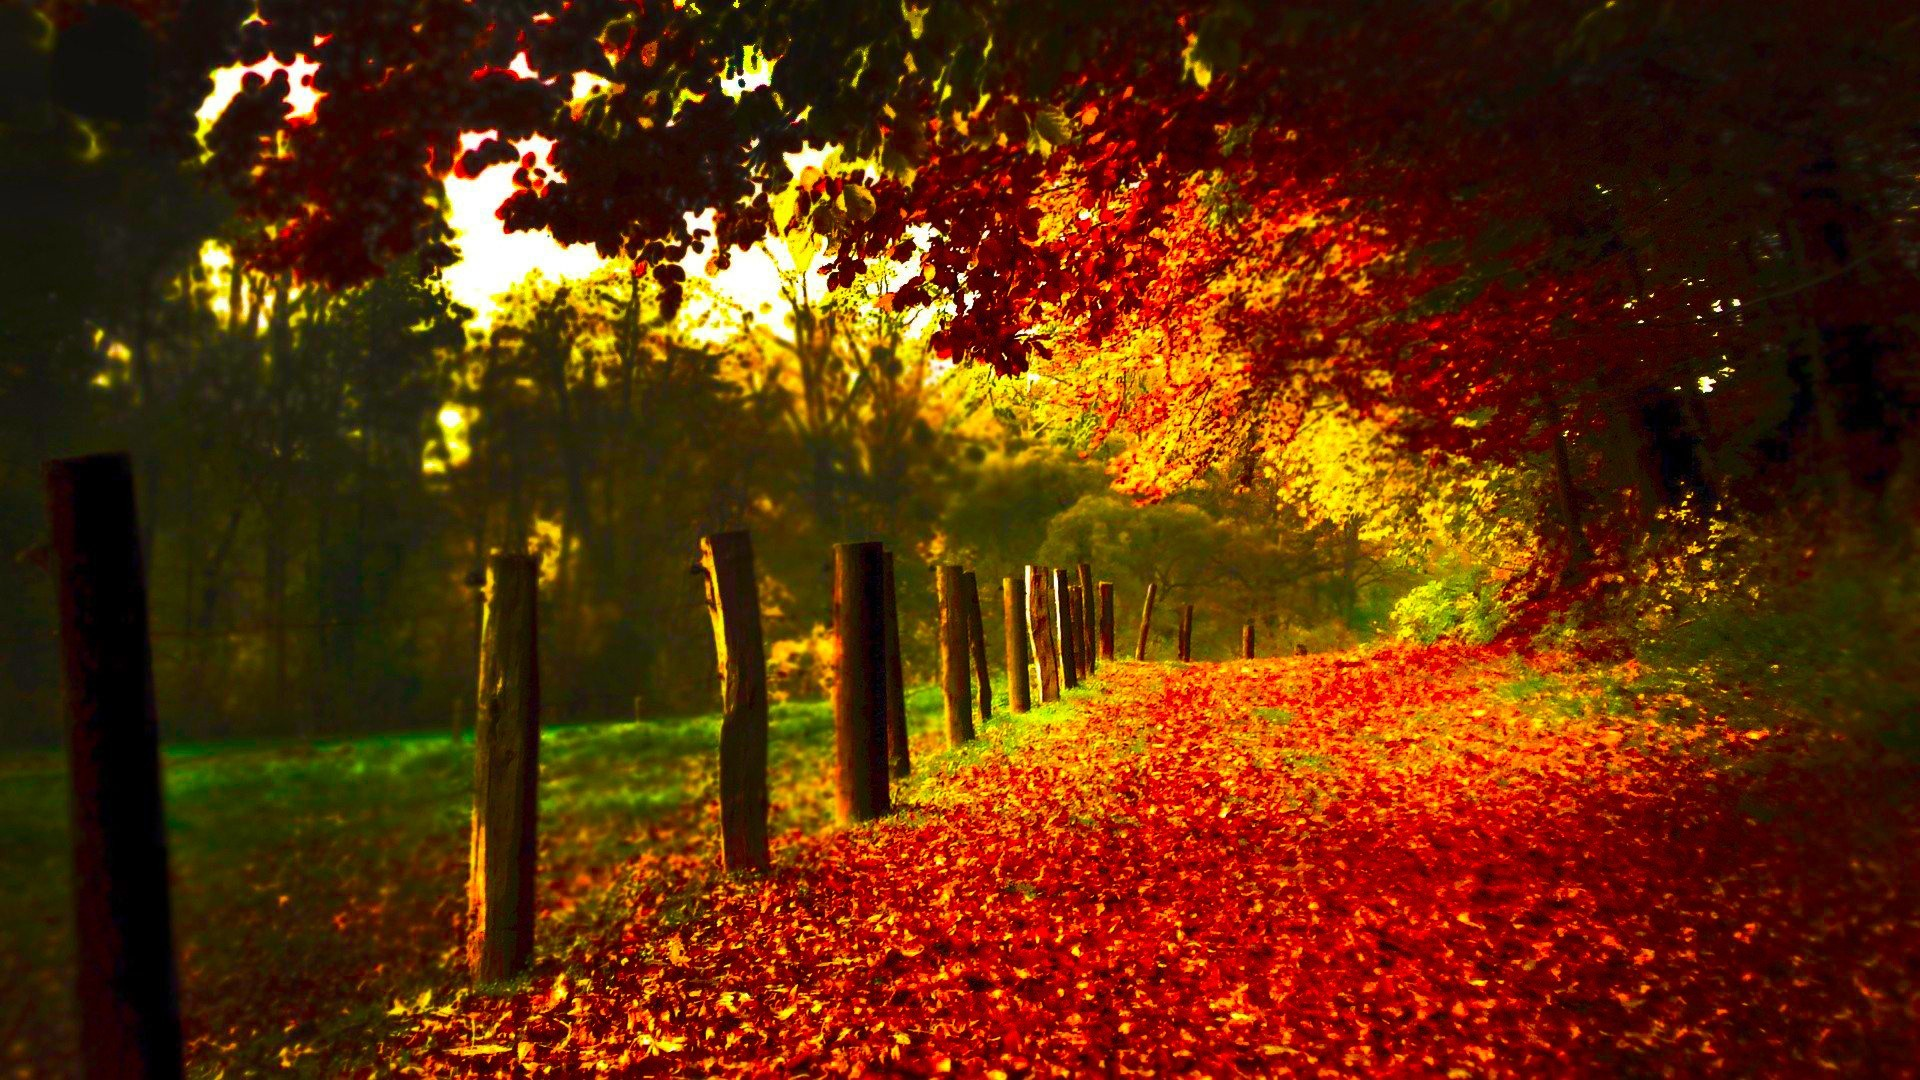 HD Fall Scenery Photos.